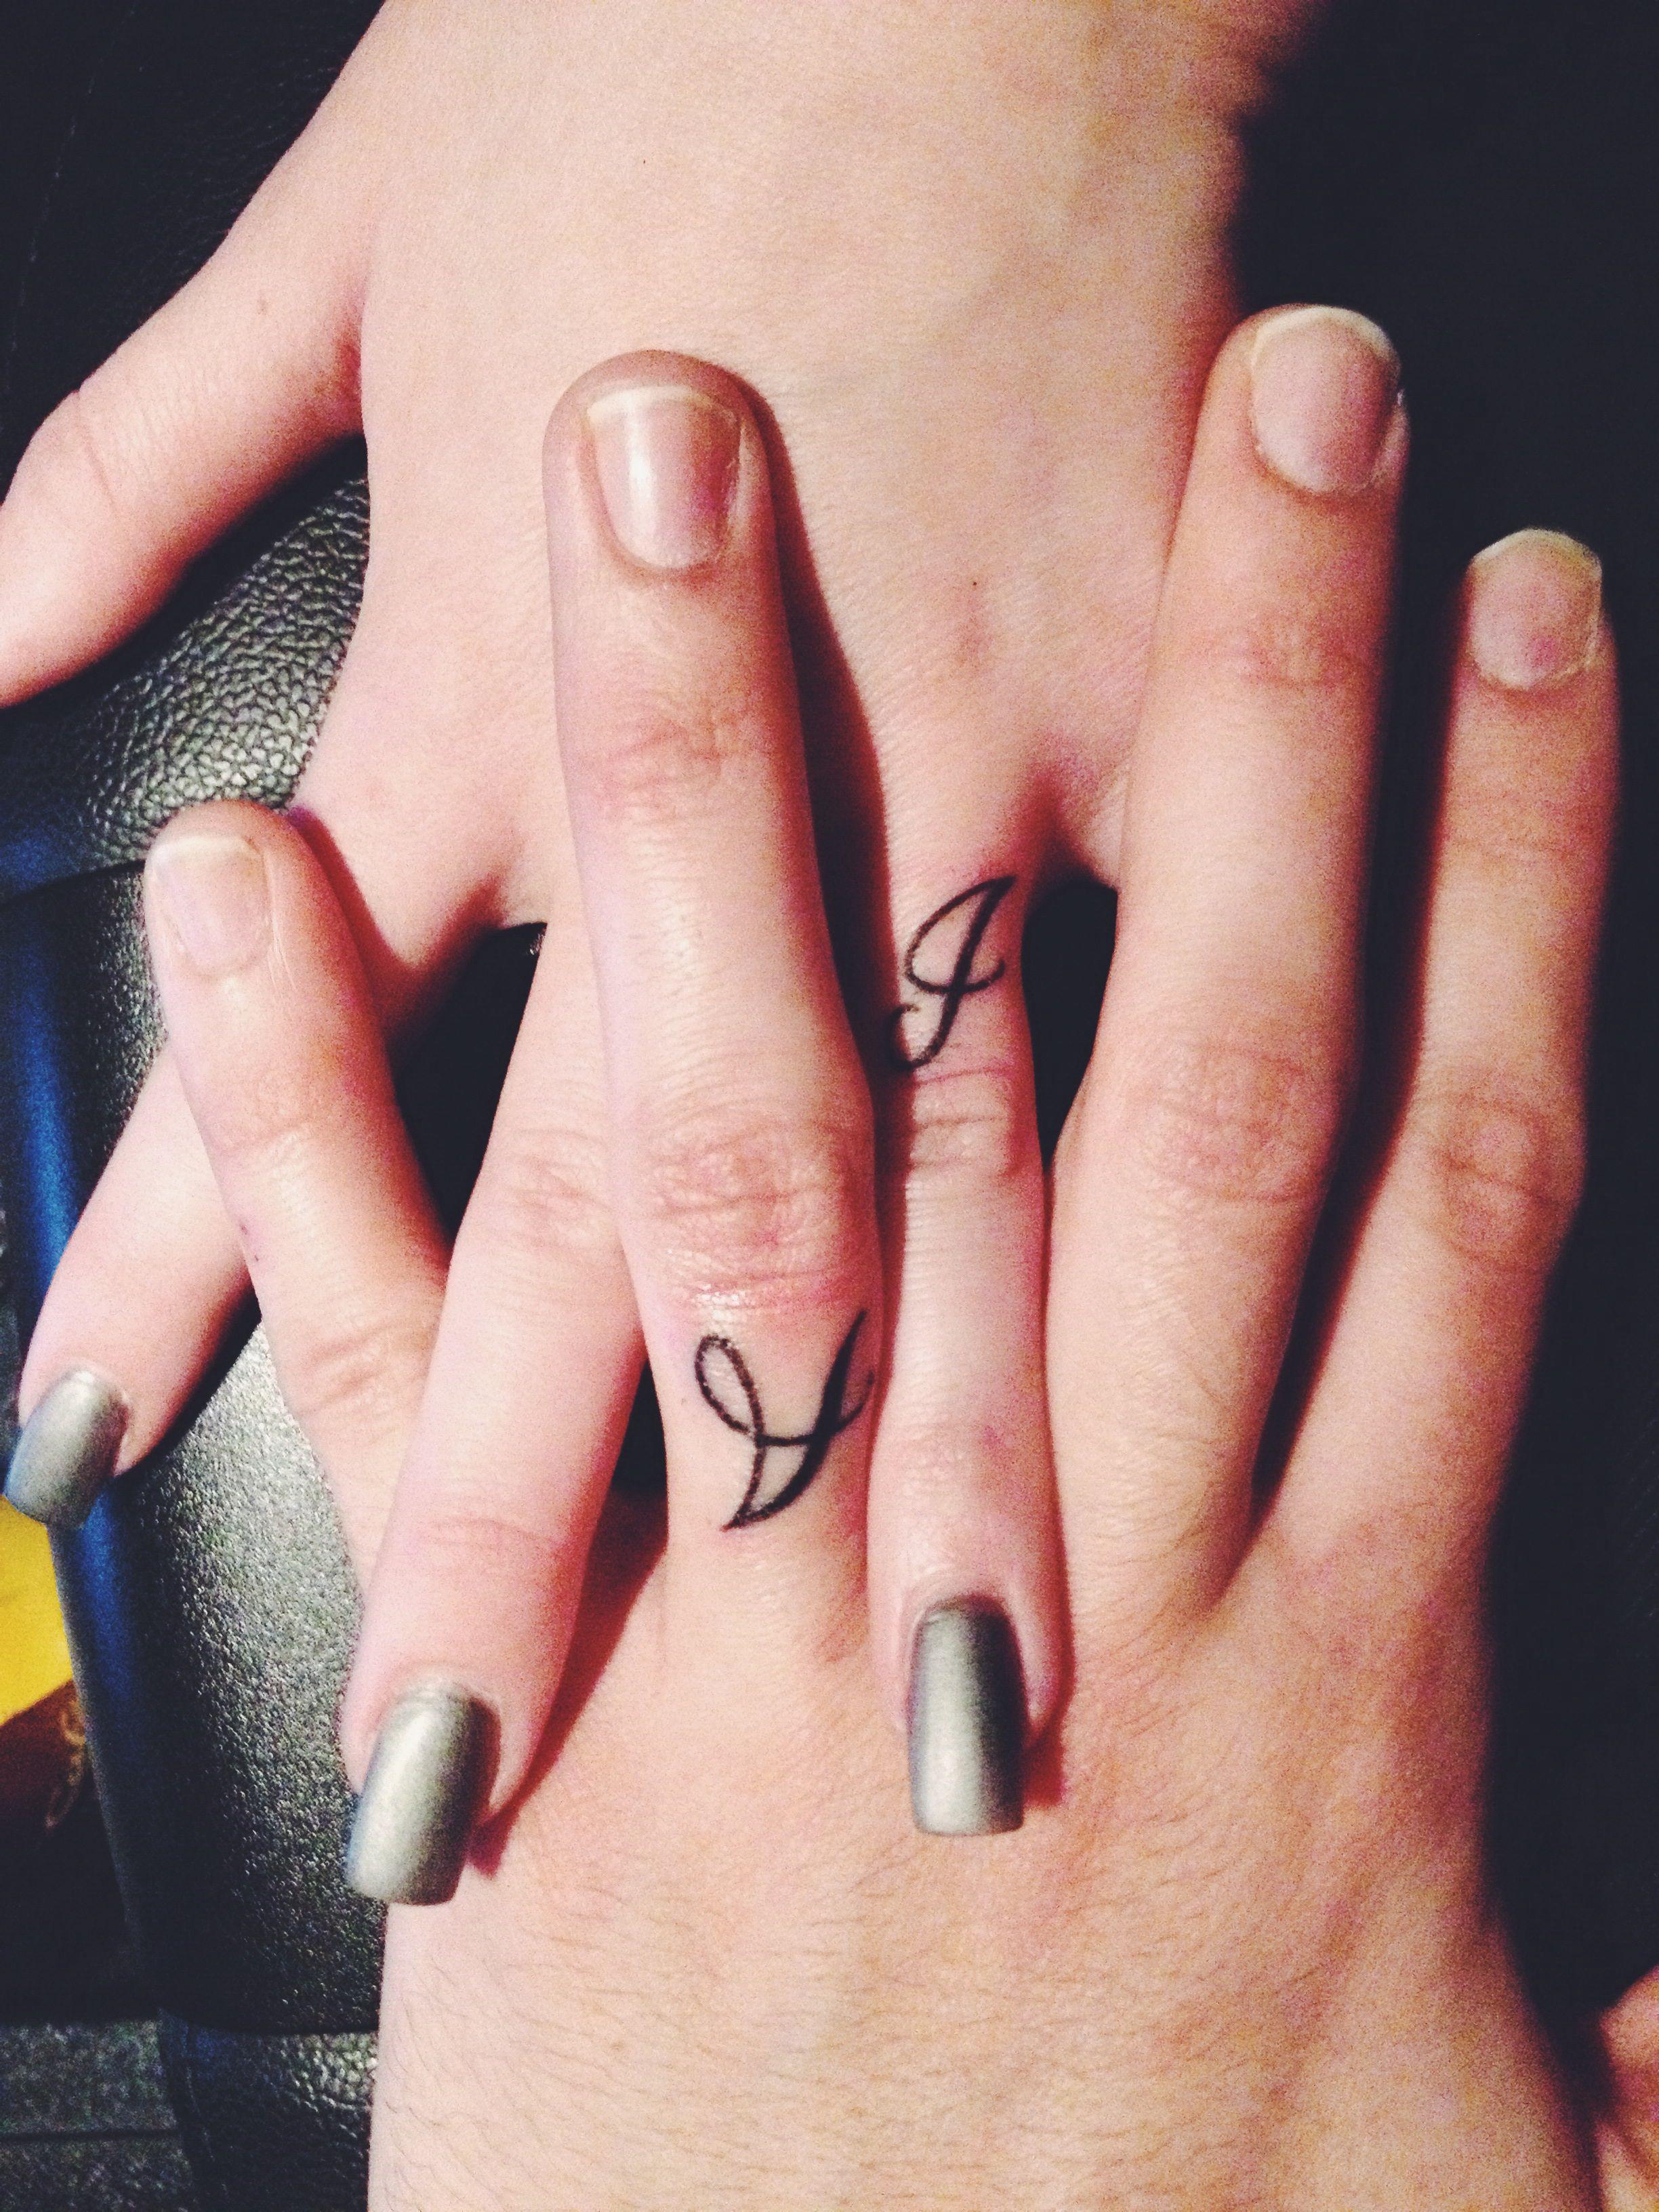 marriage ring finger tattoos tattoos pinterest. Black Bedroom Furniture Sets. Home Design Ideas